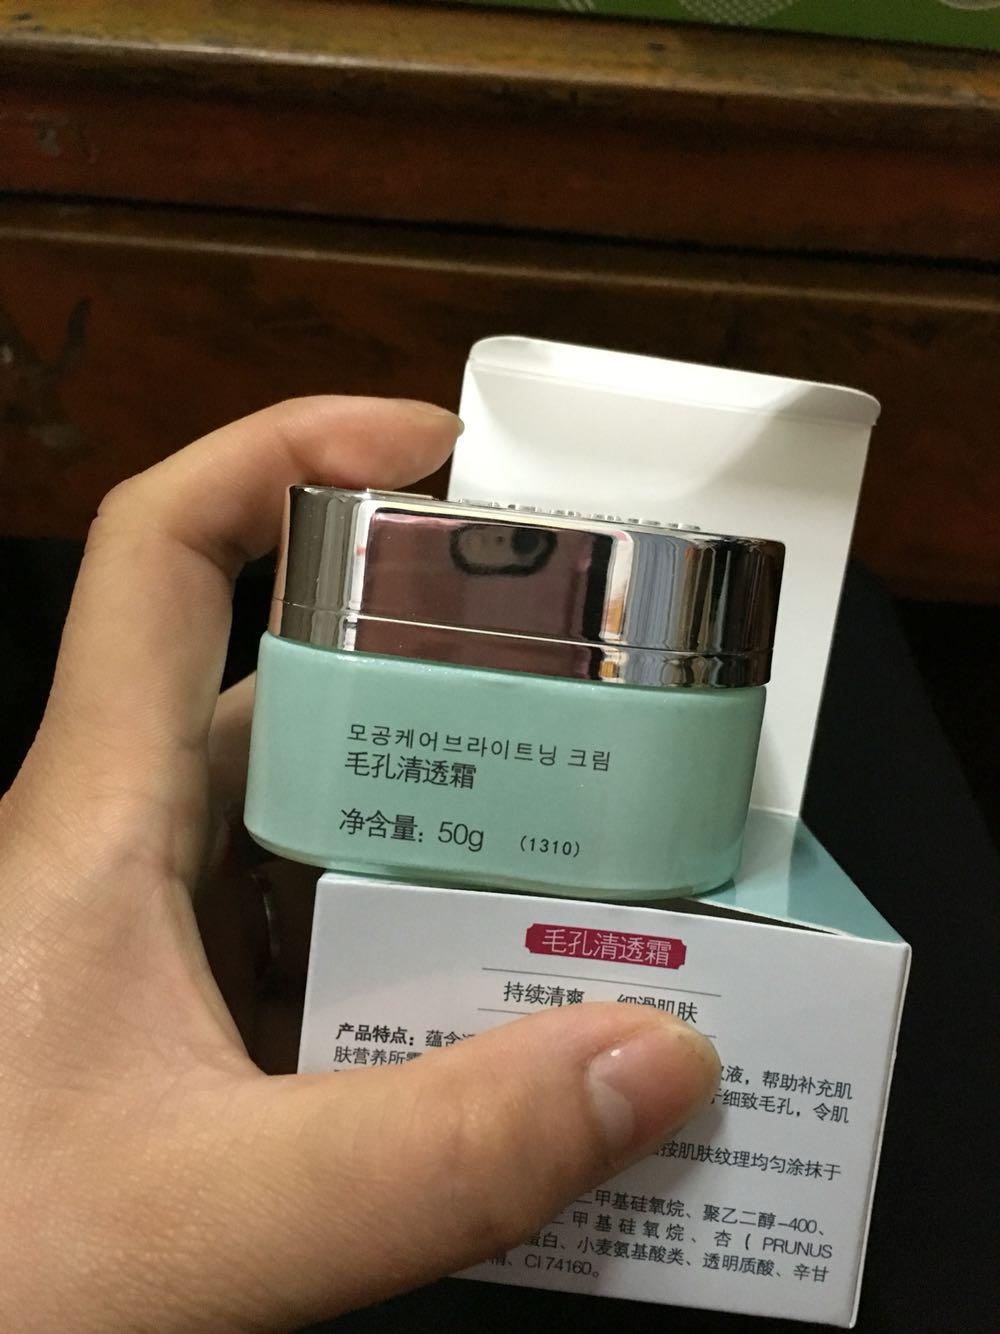 hyperfuse air max black 00243365 cheapest